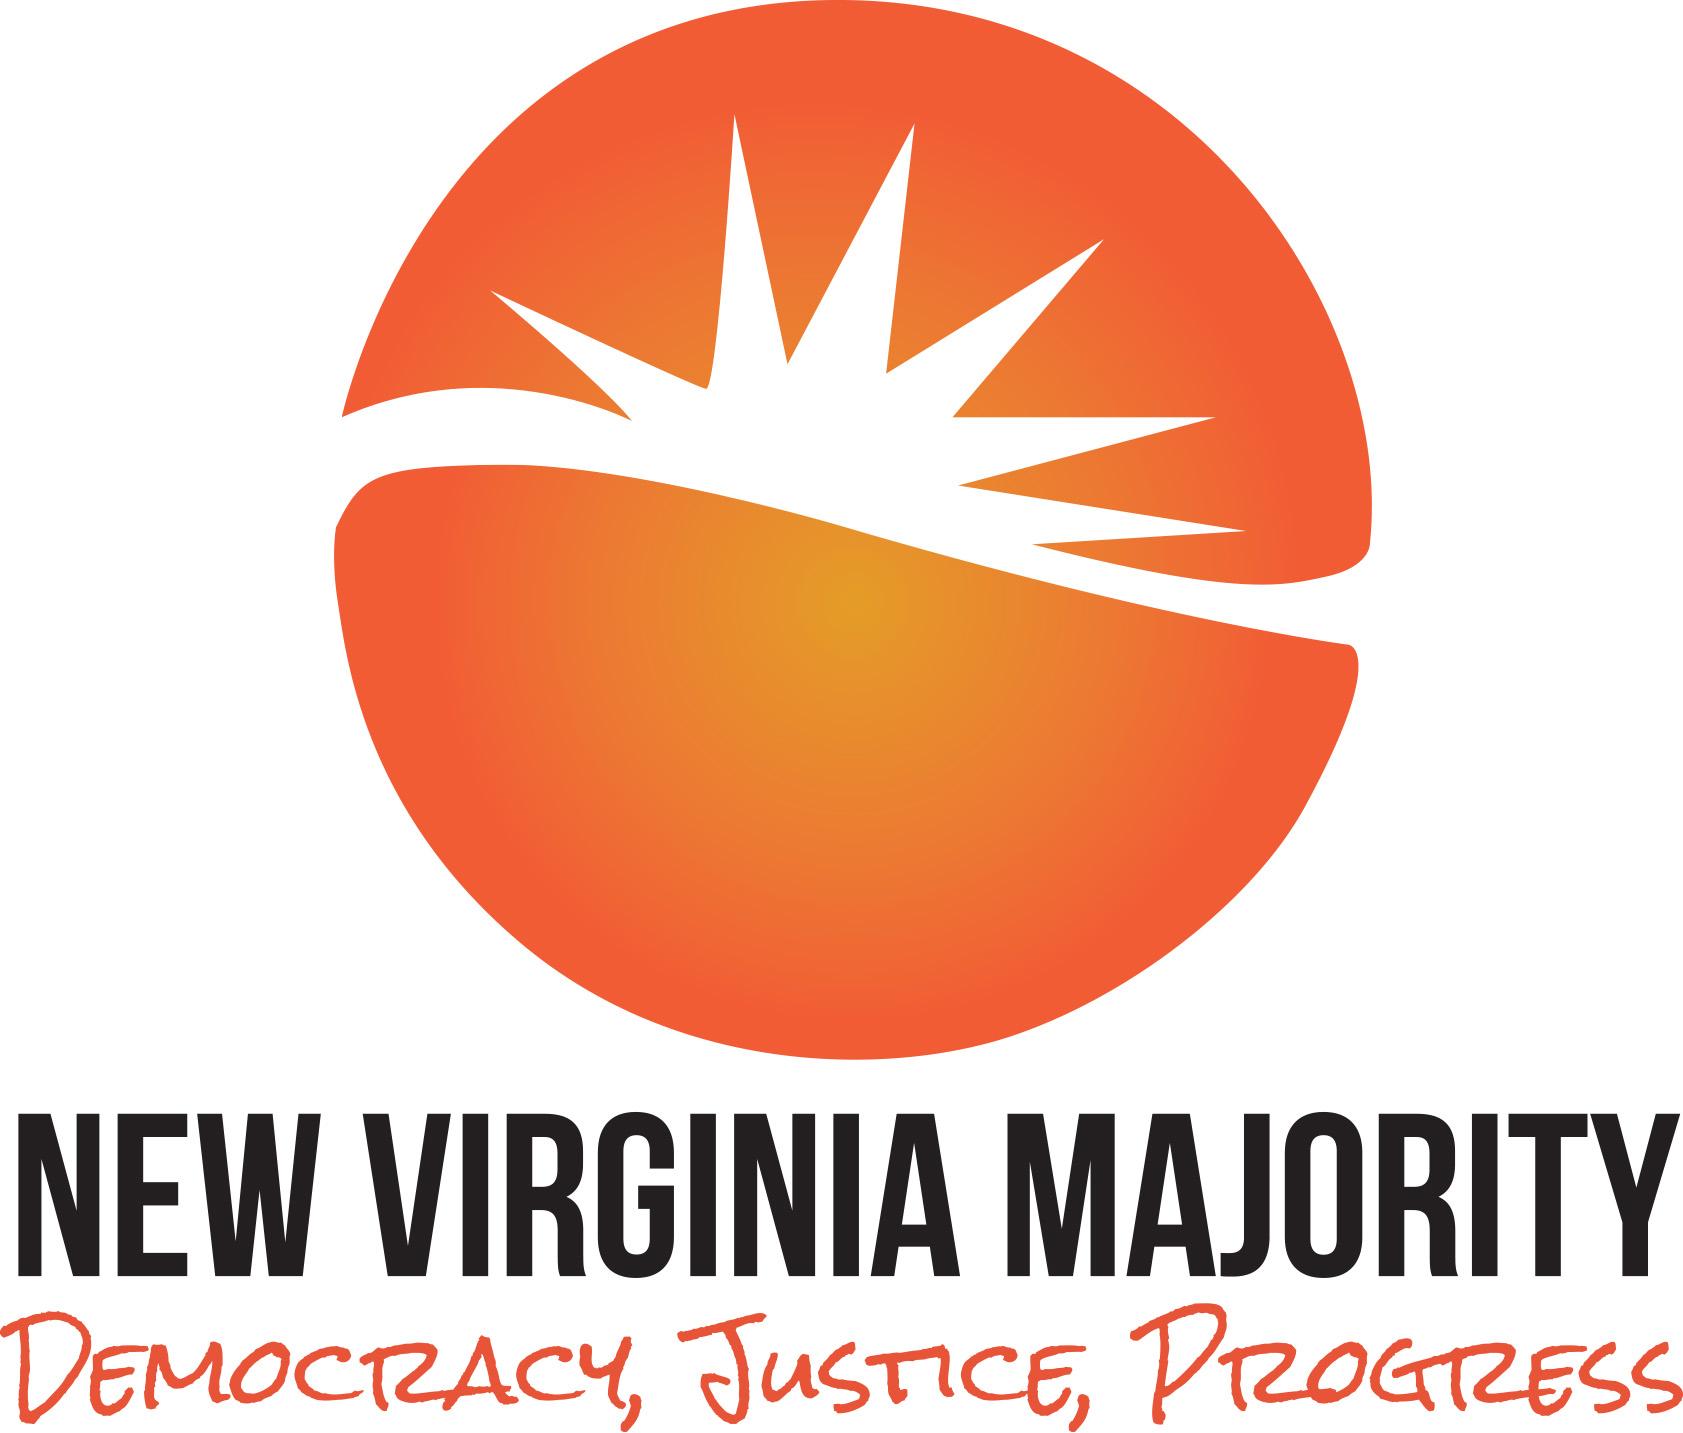 Rights Restoration and Voter Registration Drive